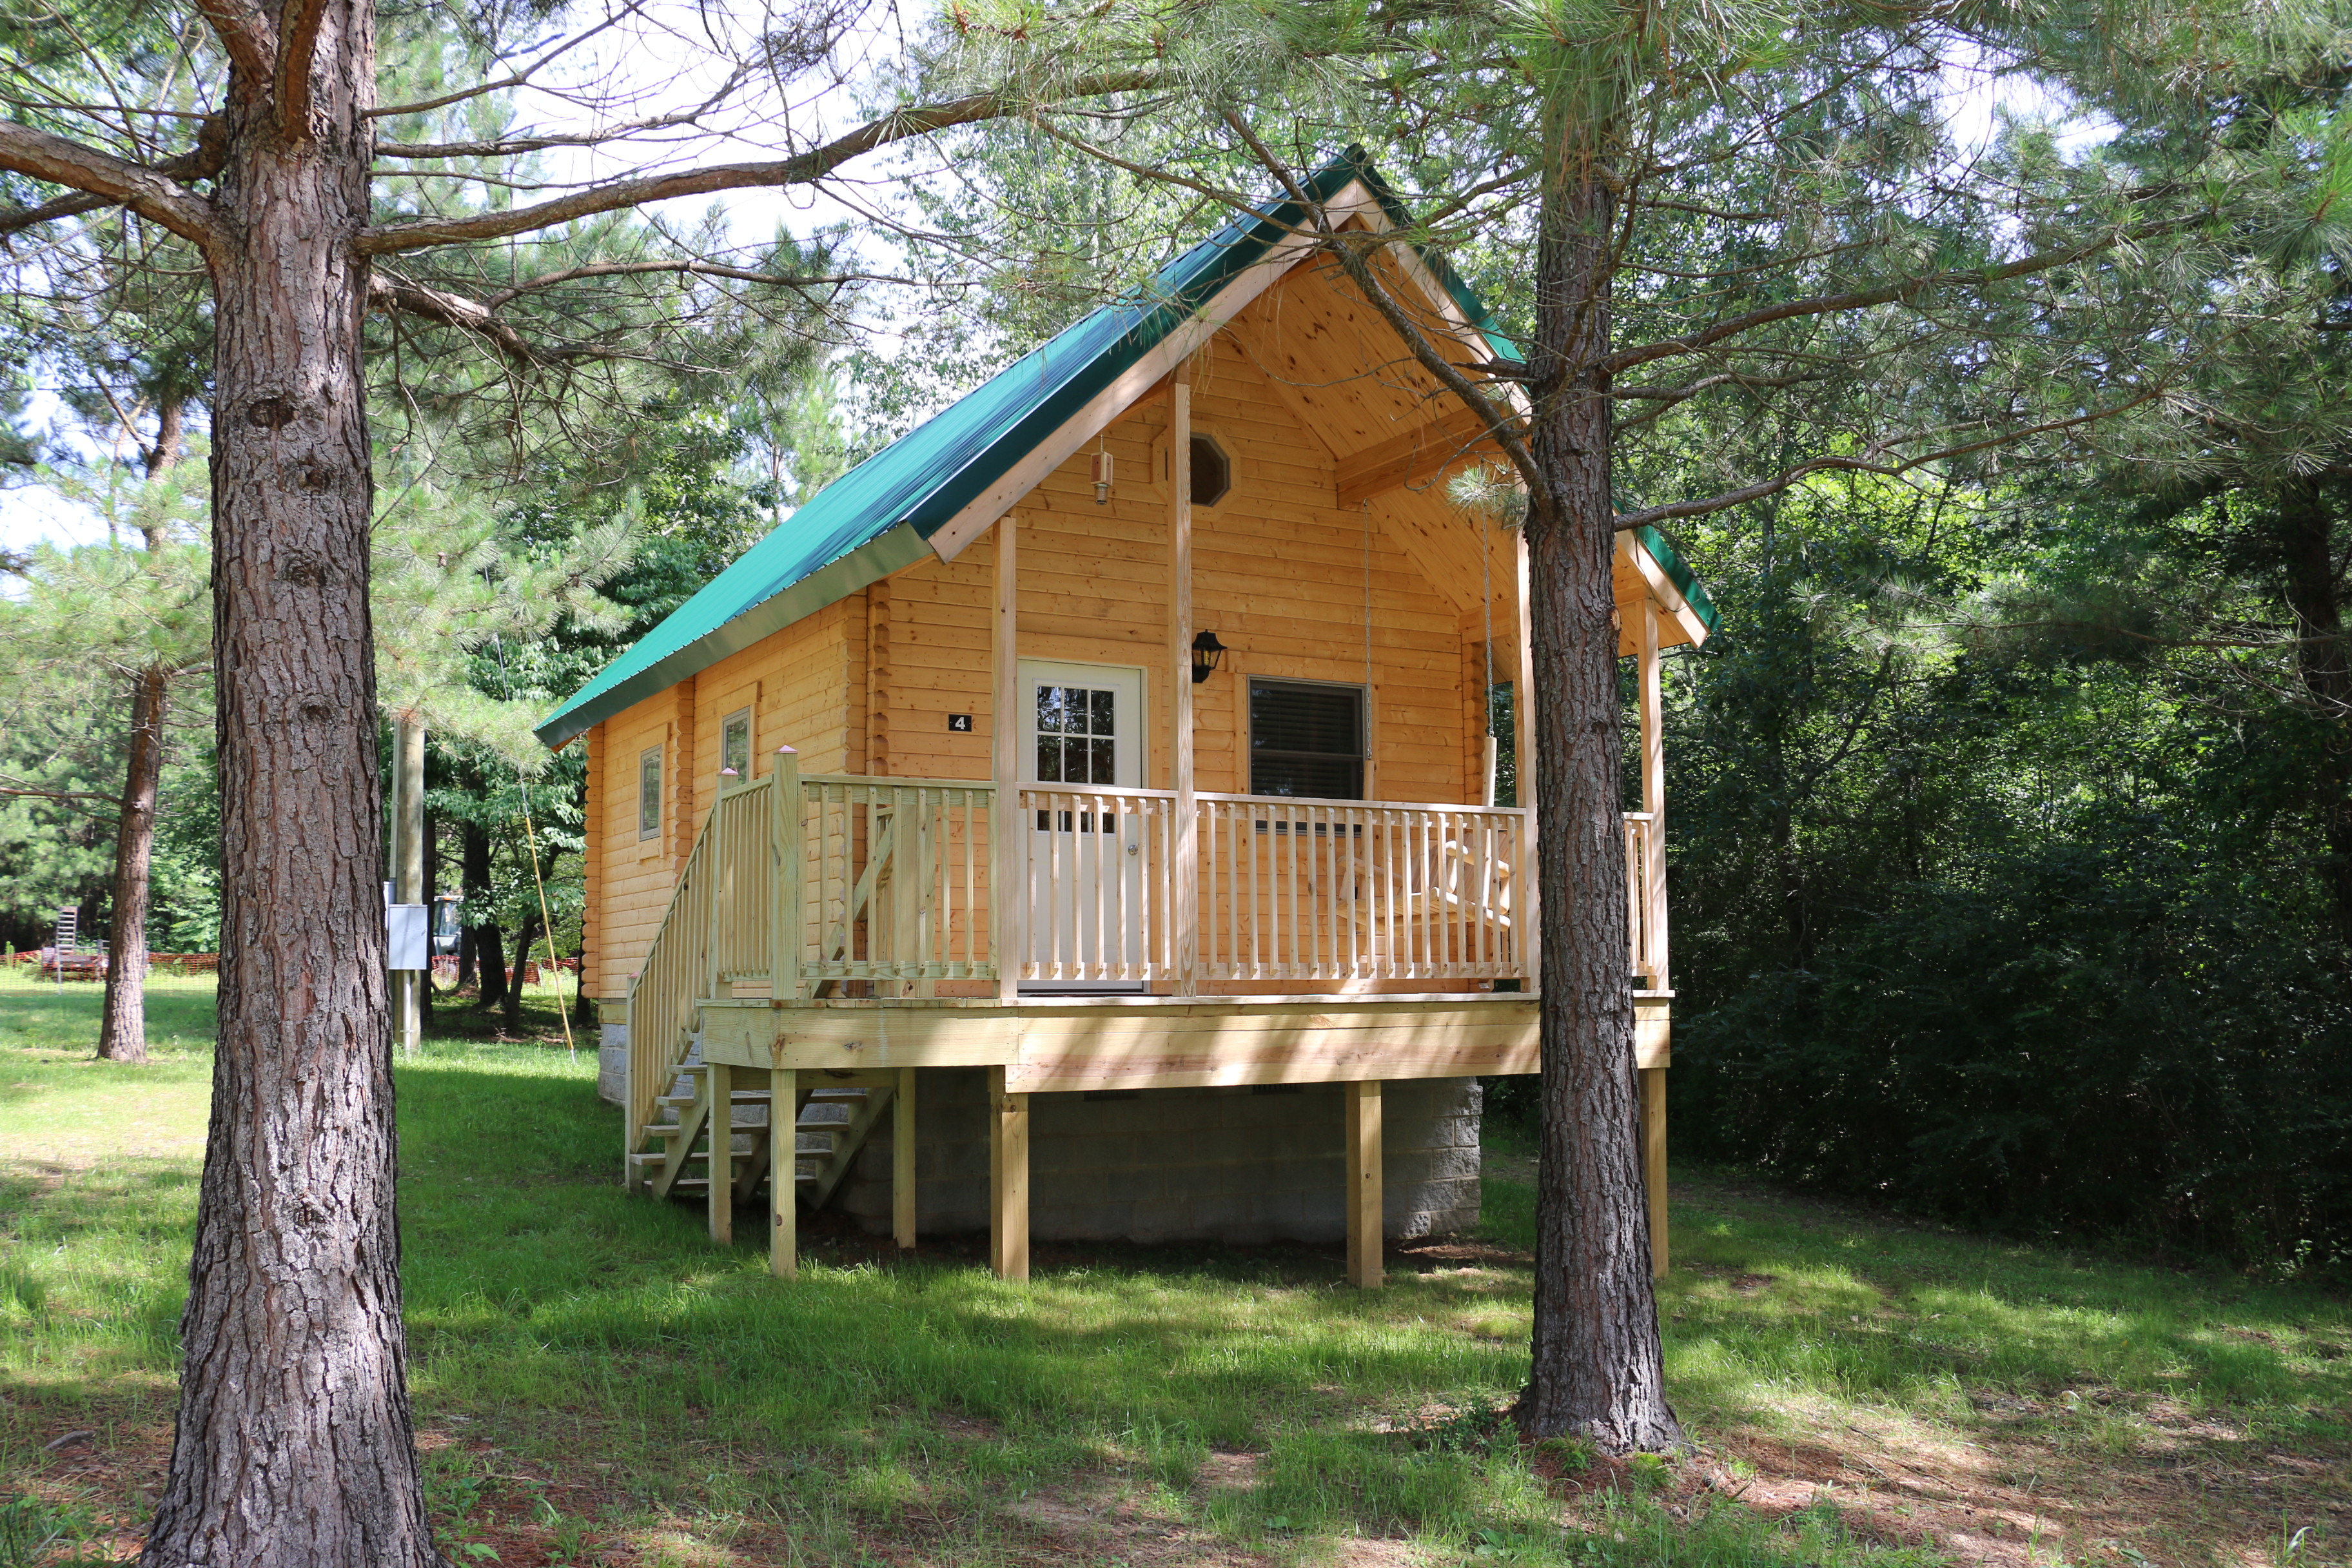 clayton talentneeds cabin cabins in dahlonega com ga georgia rentals